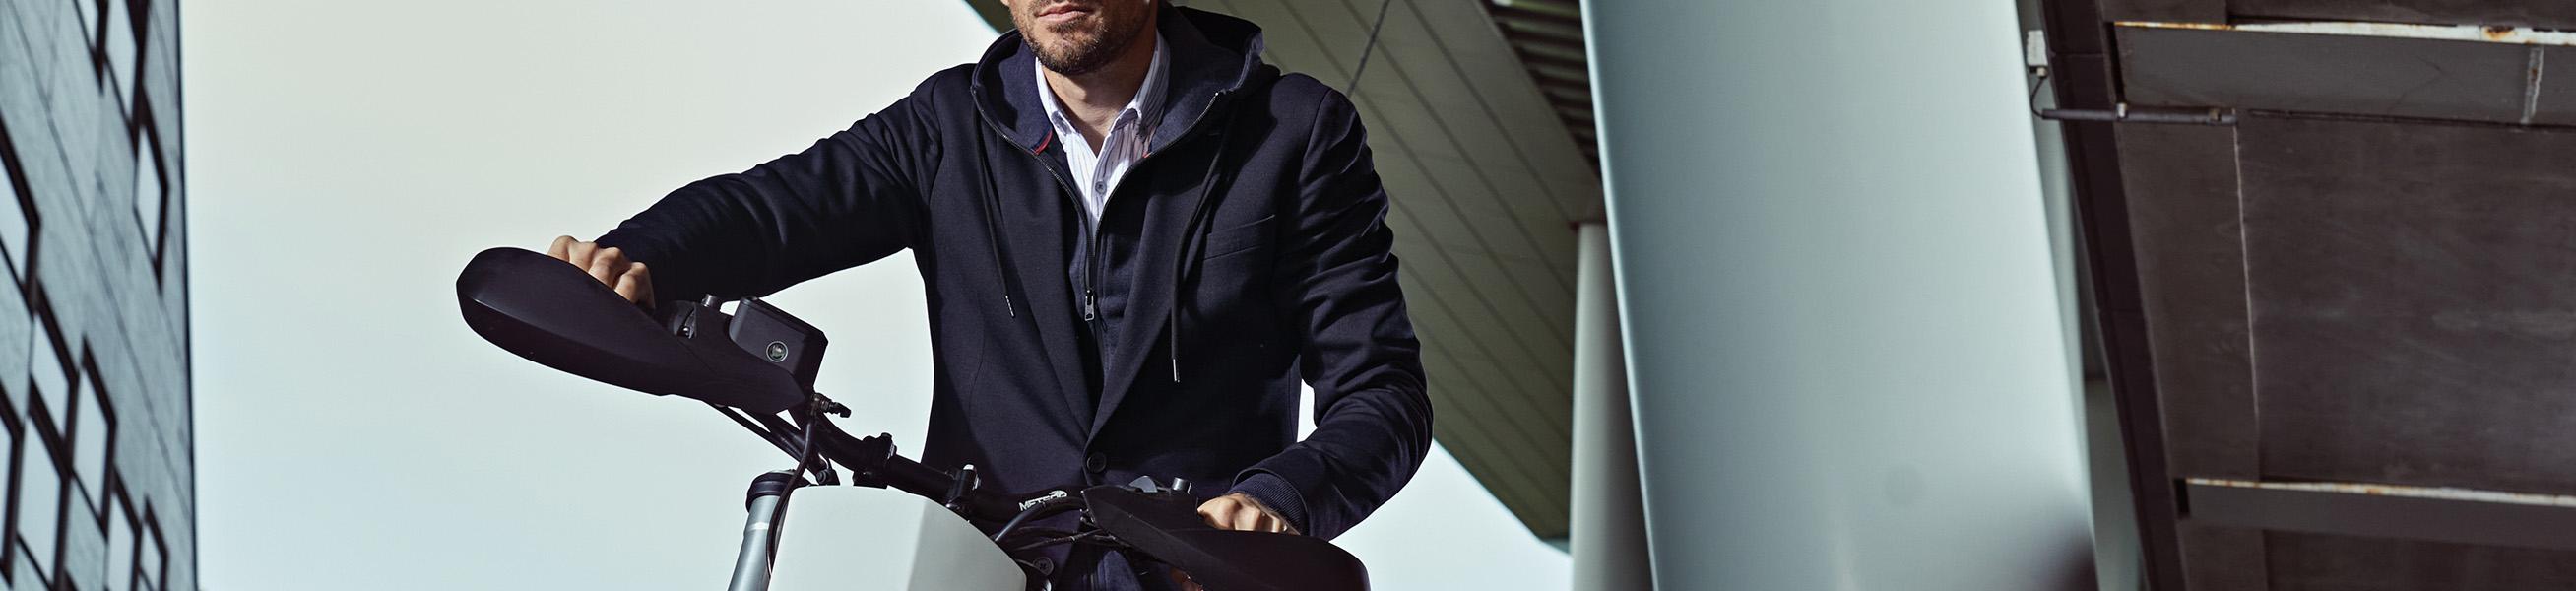 Vanguard Coats & Leather Jackets